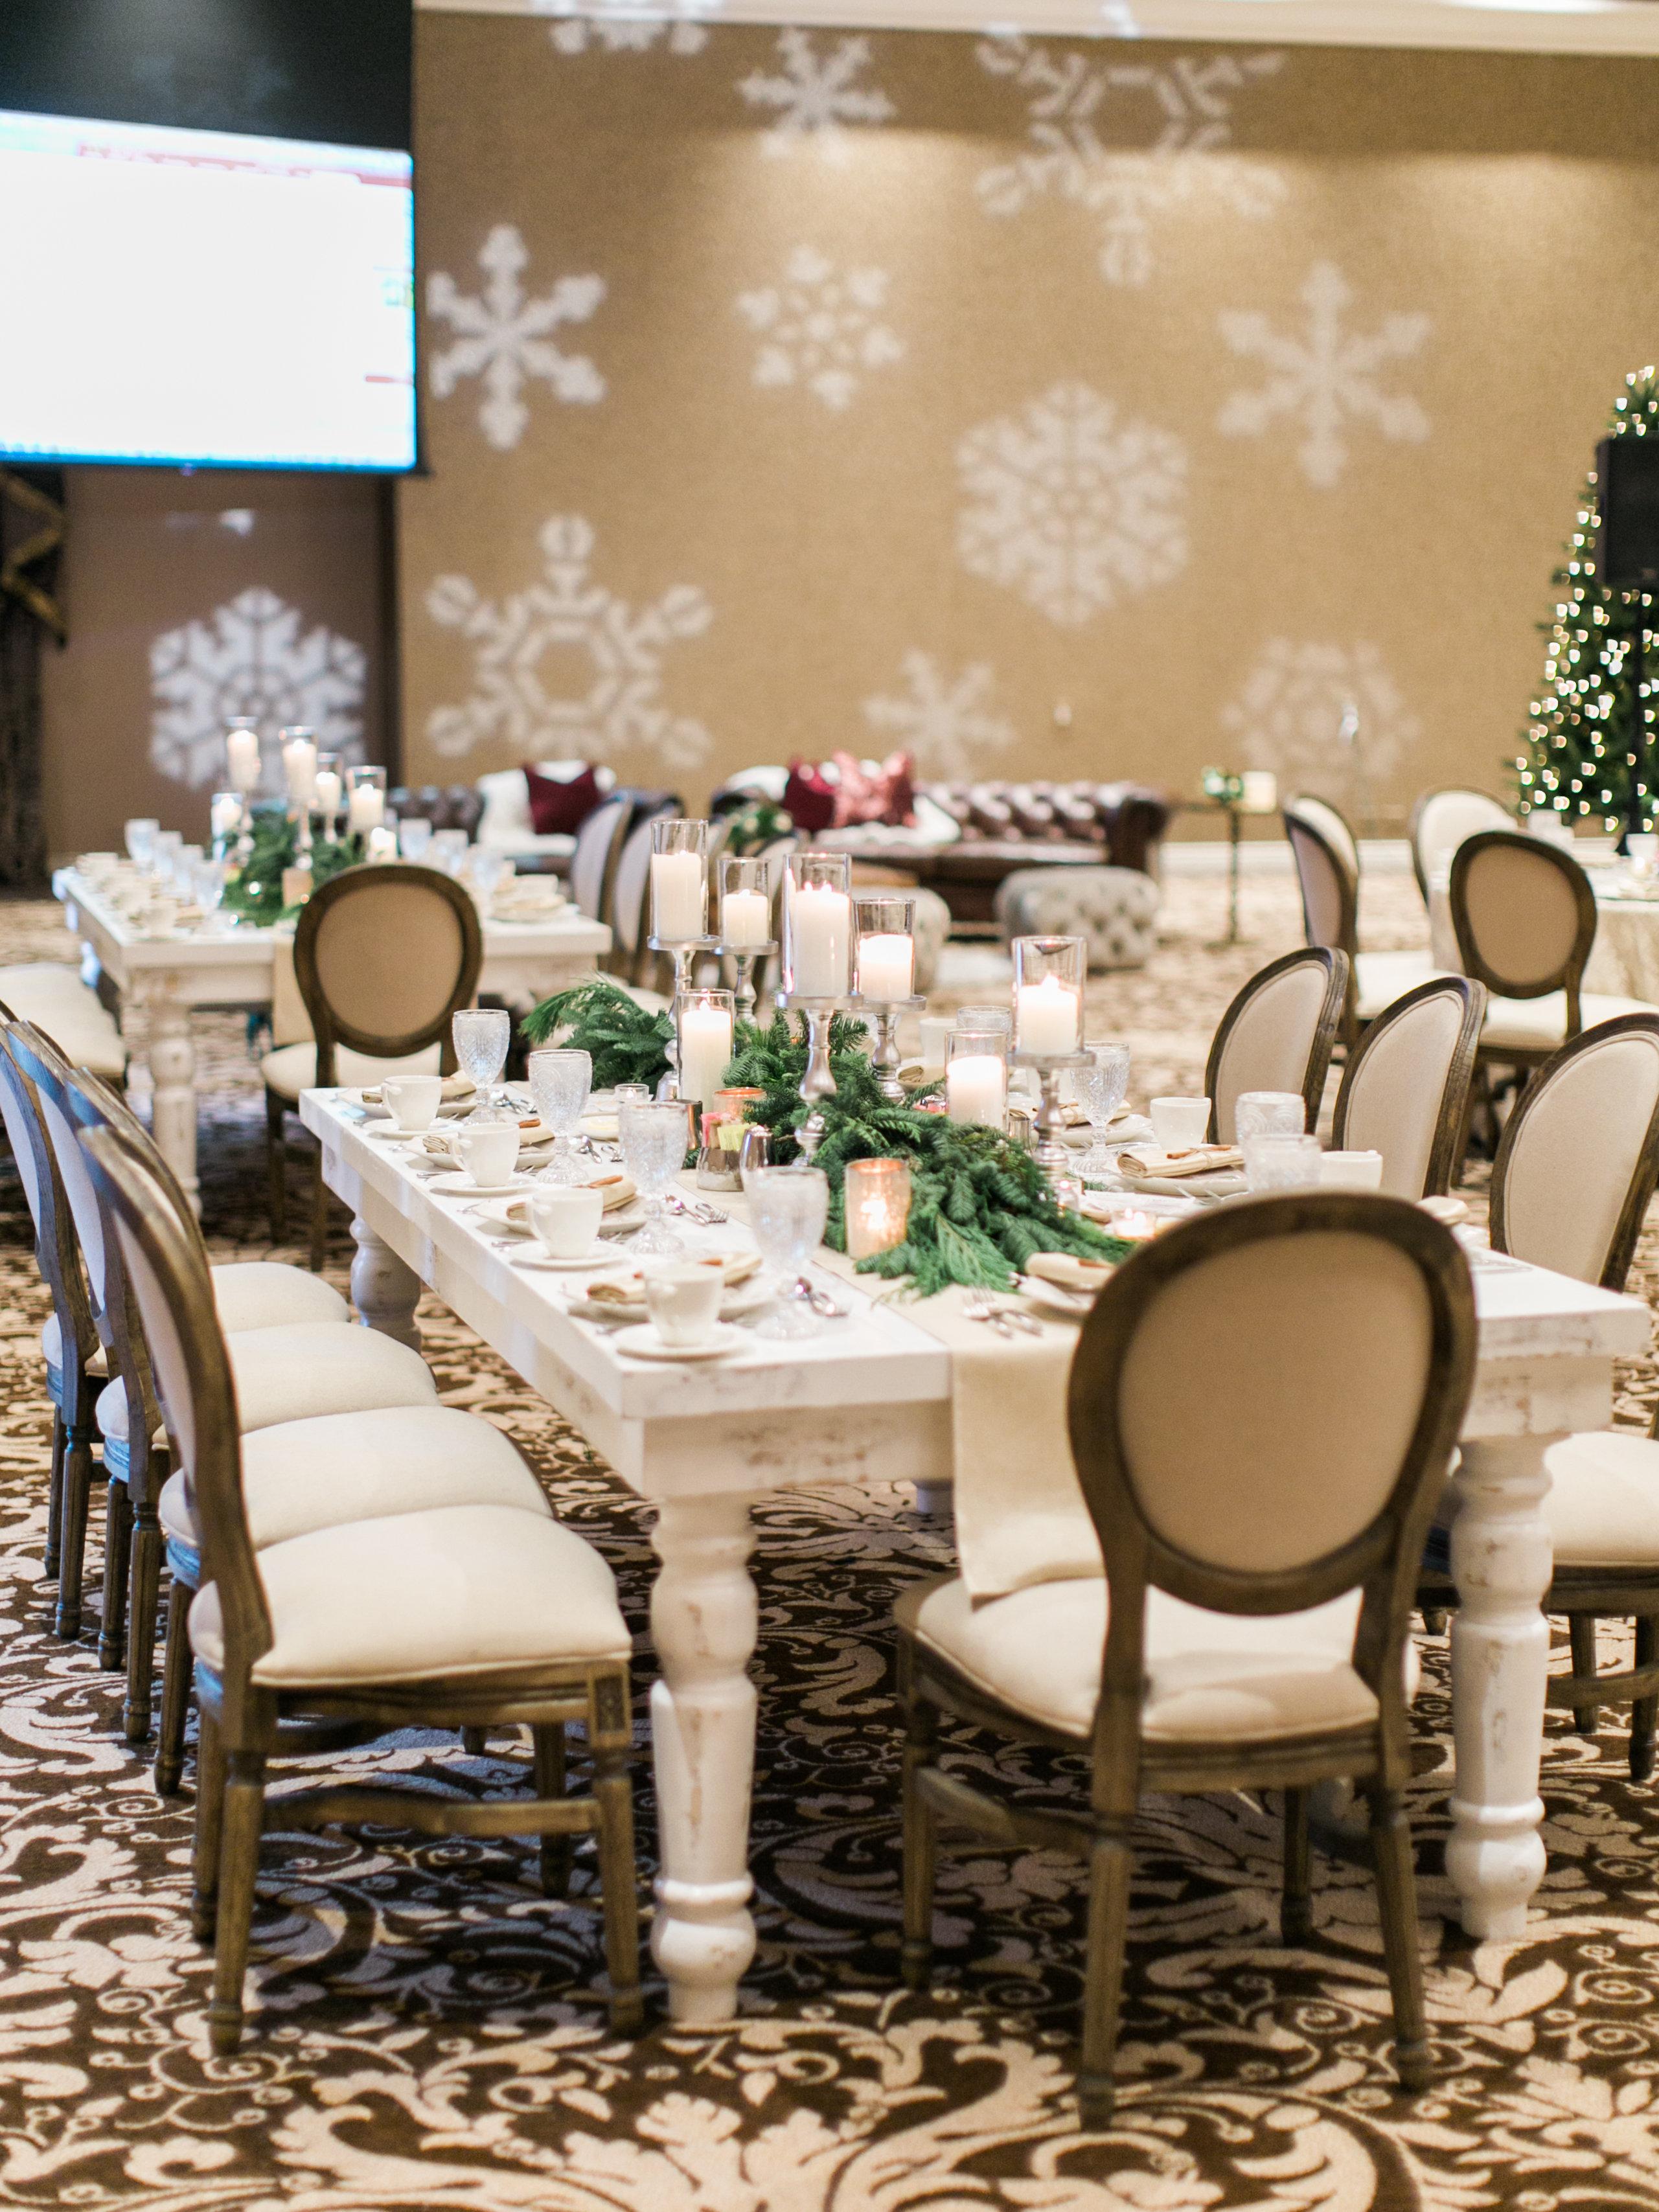 All Bundled Up WIPA 2017 Winter Event - WIPA Phoenix